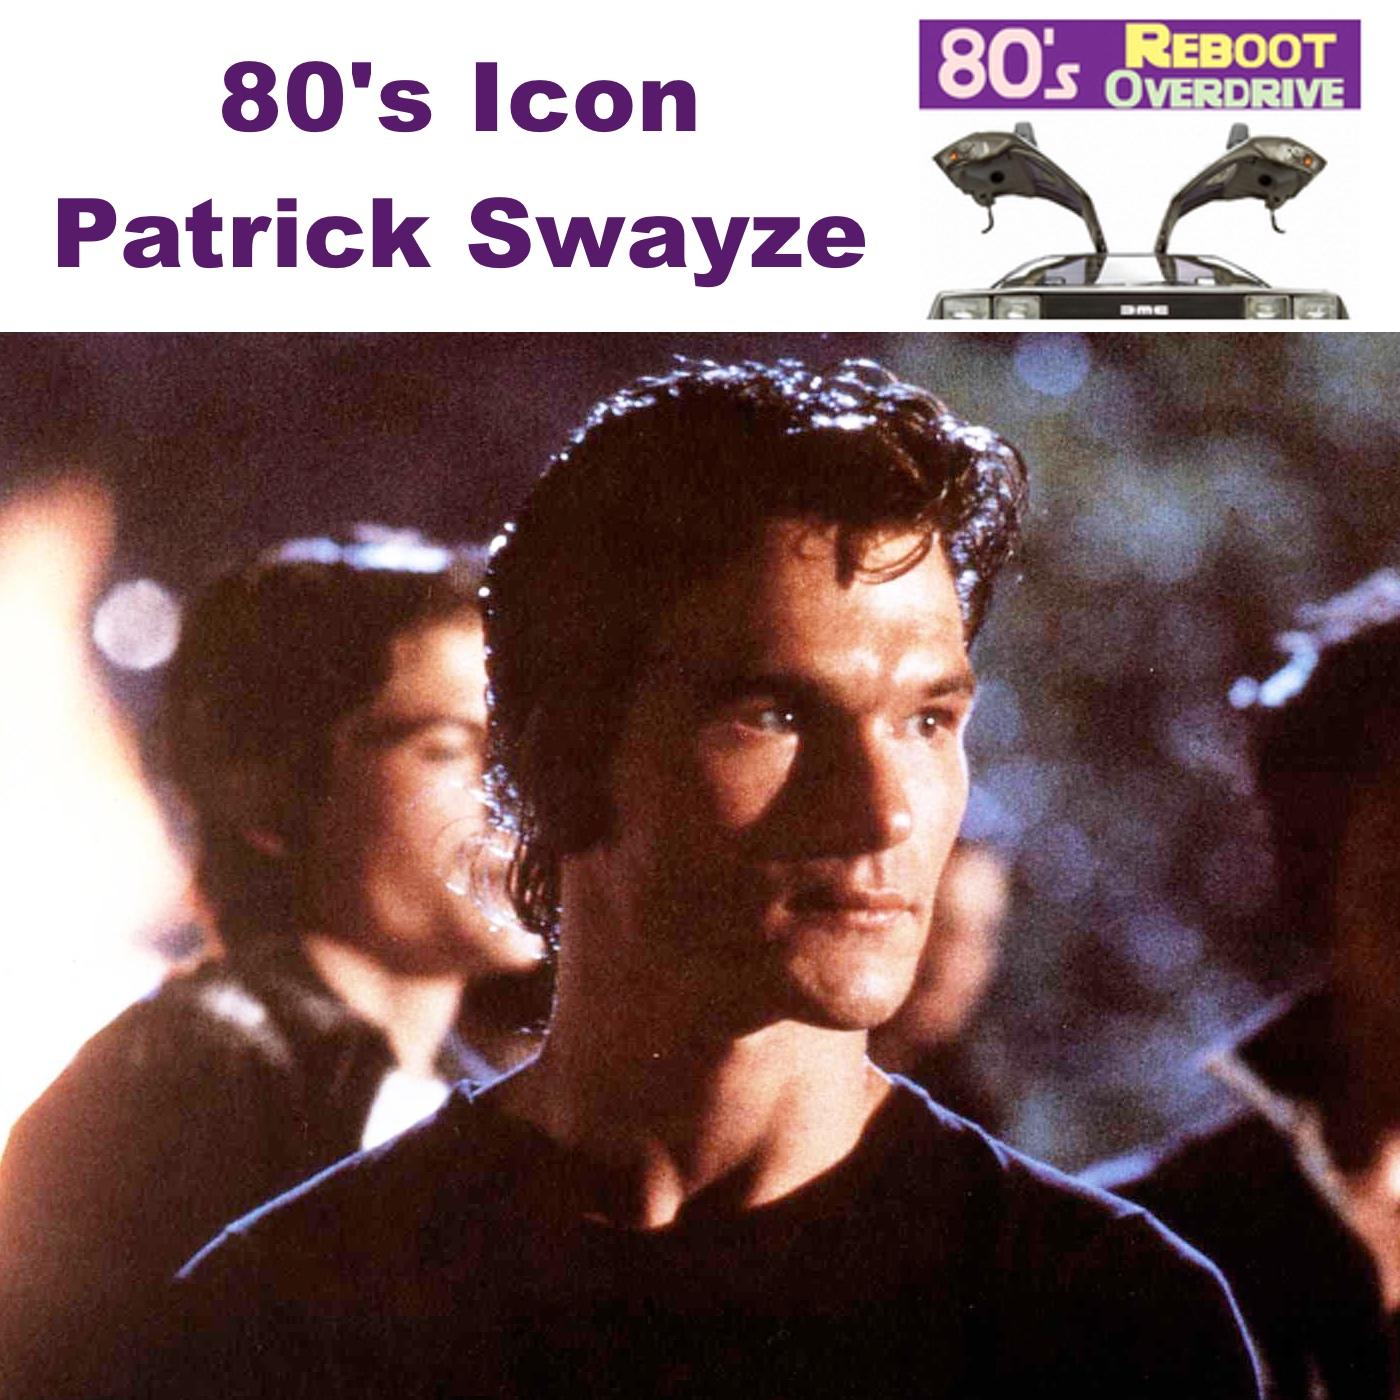 80's Icon Patrick Swayze